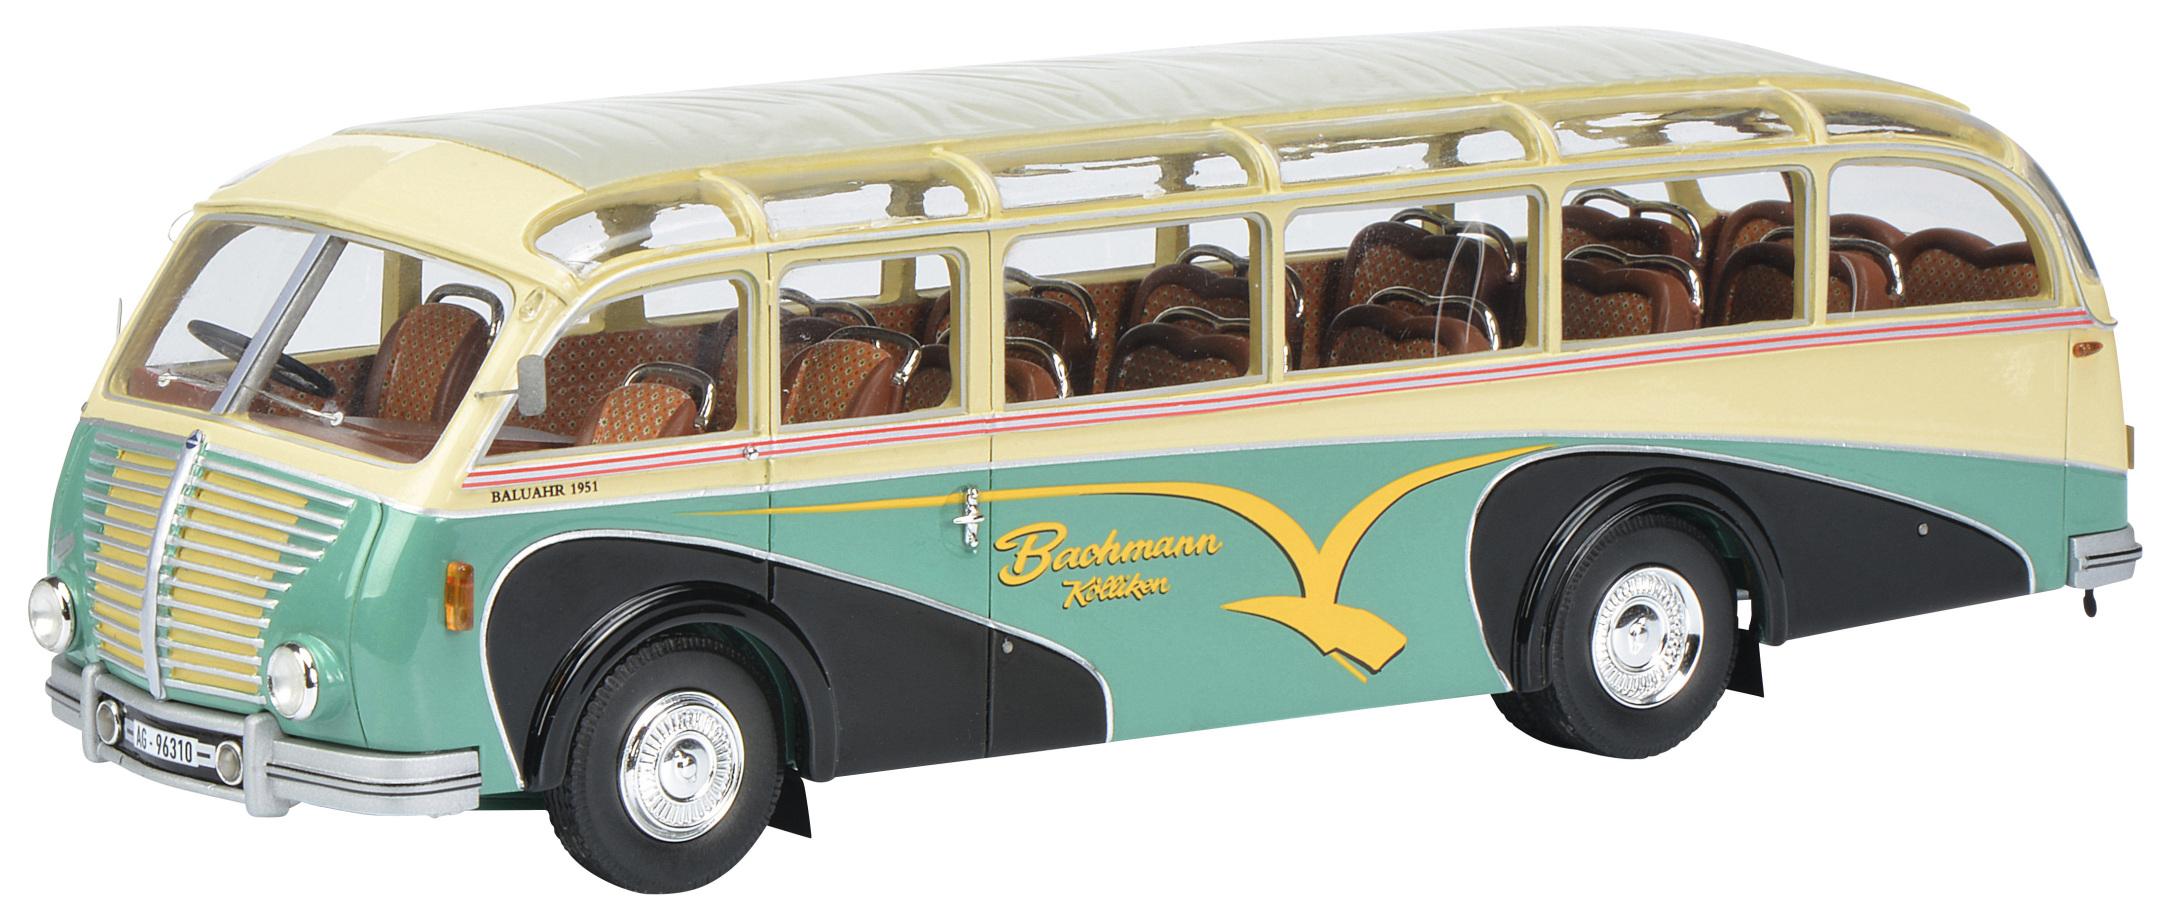 Saurer 3C-H Bus - Bachmann